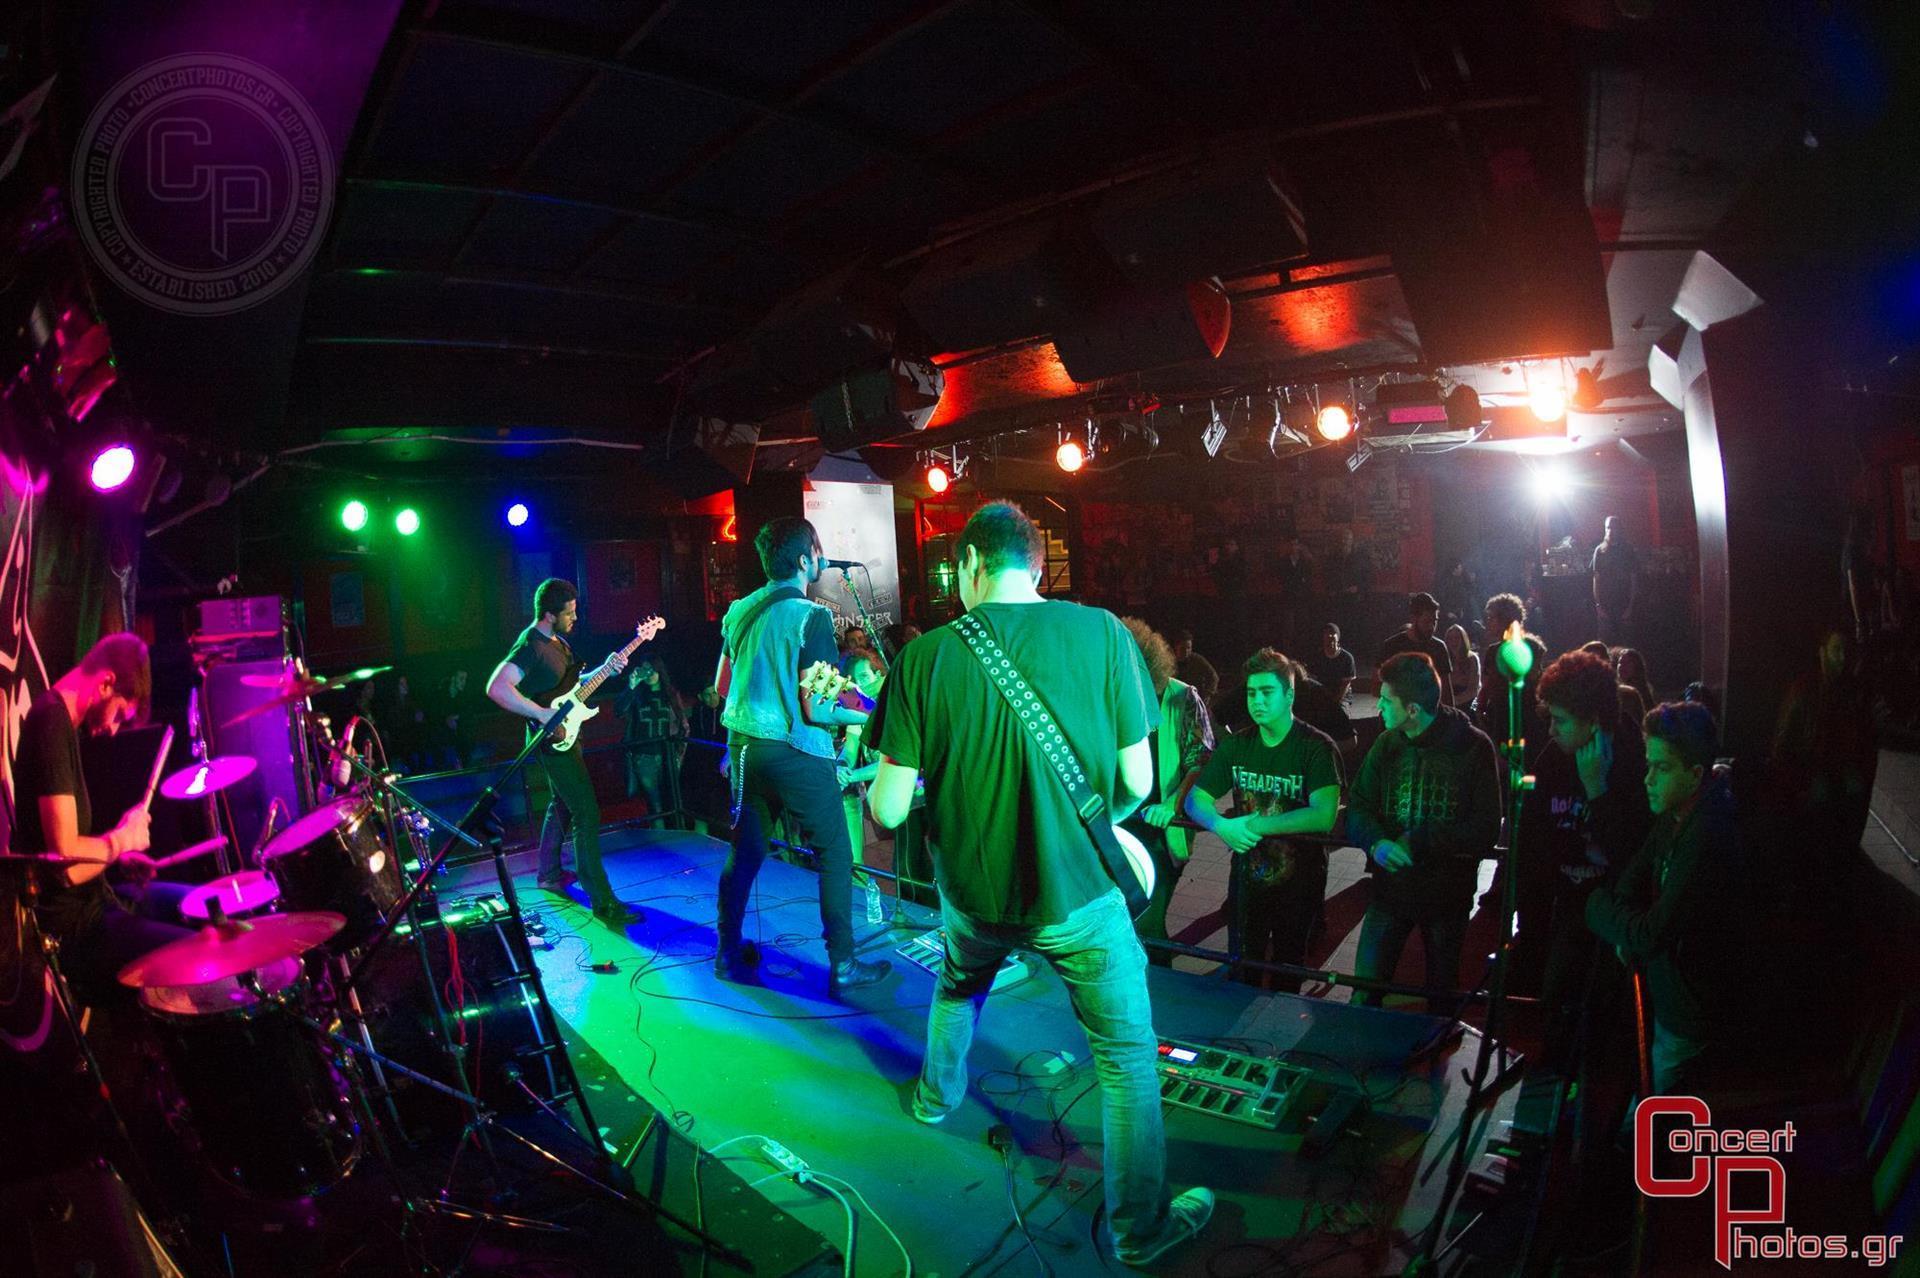 Battle Of The Bands Athens - Leg 3- photographer:  - ConcertPhotos - 20150104_2234_22